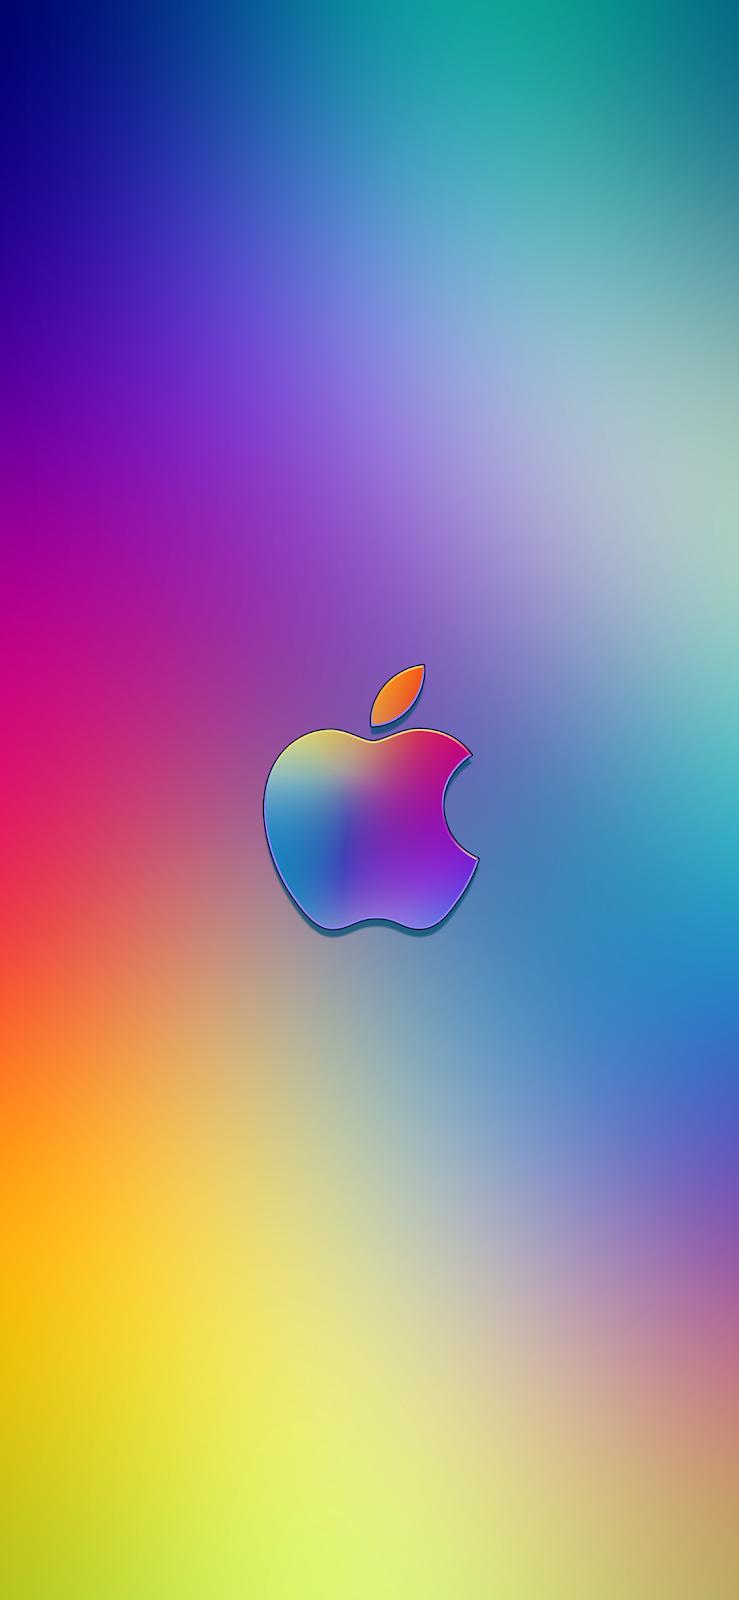 Gradient Apple Logo Iphone X Apple Logo Wallpaper Iphone